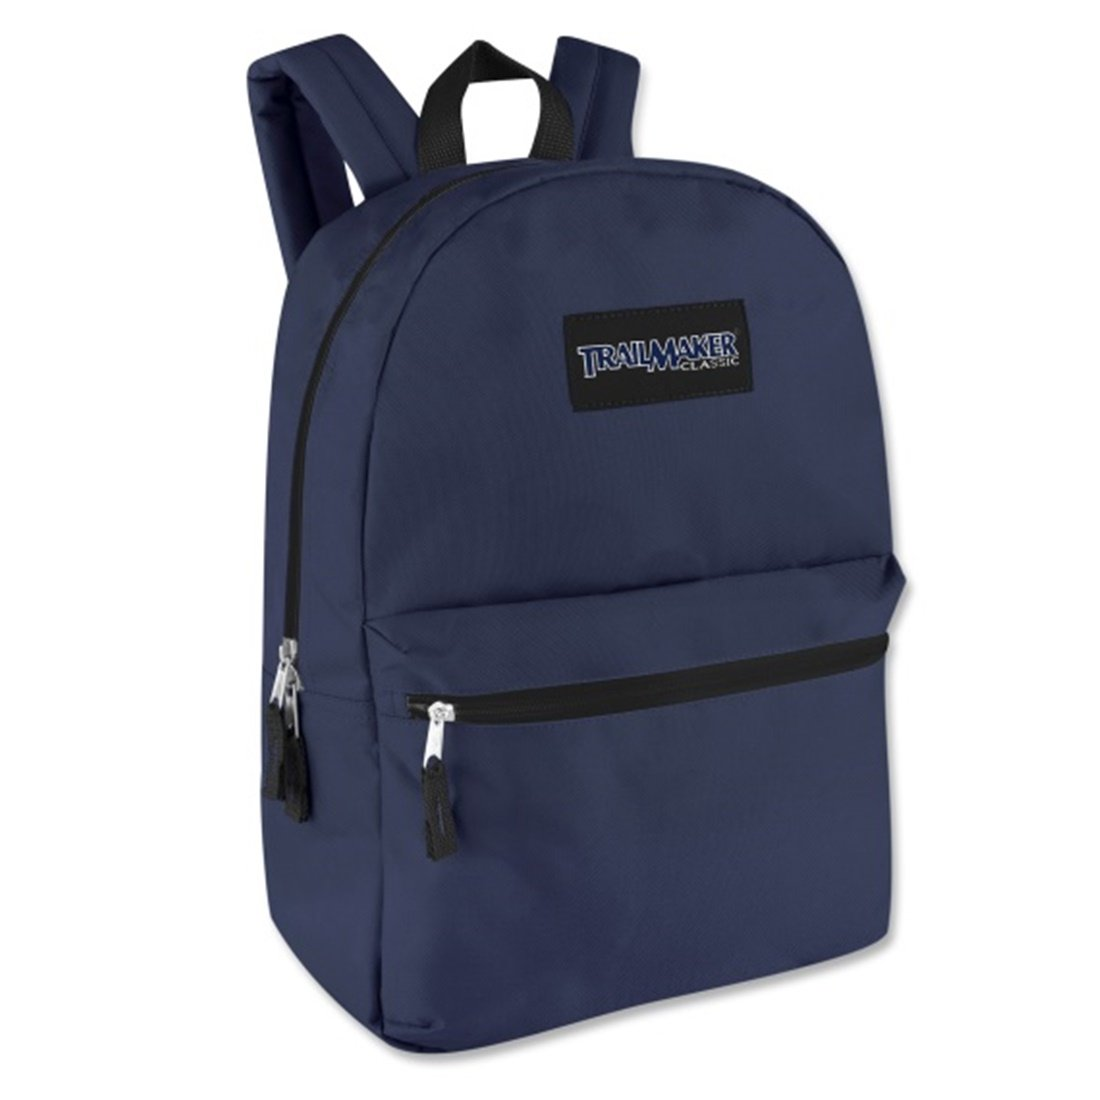 Trailmaker バックパック ブックバッグ 17インチ B079KB89HB One Size|Dark Blue (06) Dark Blue (06) One Size